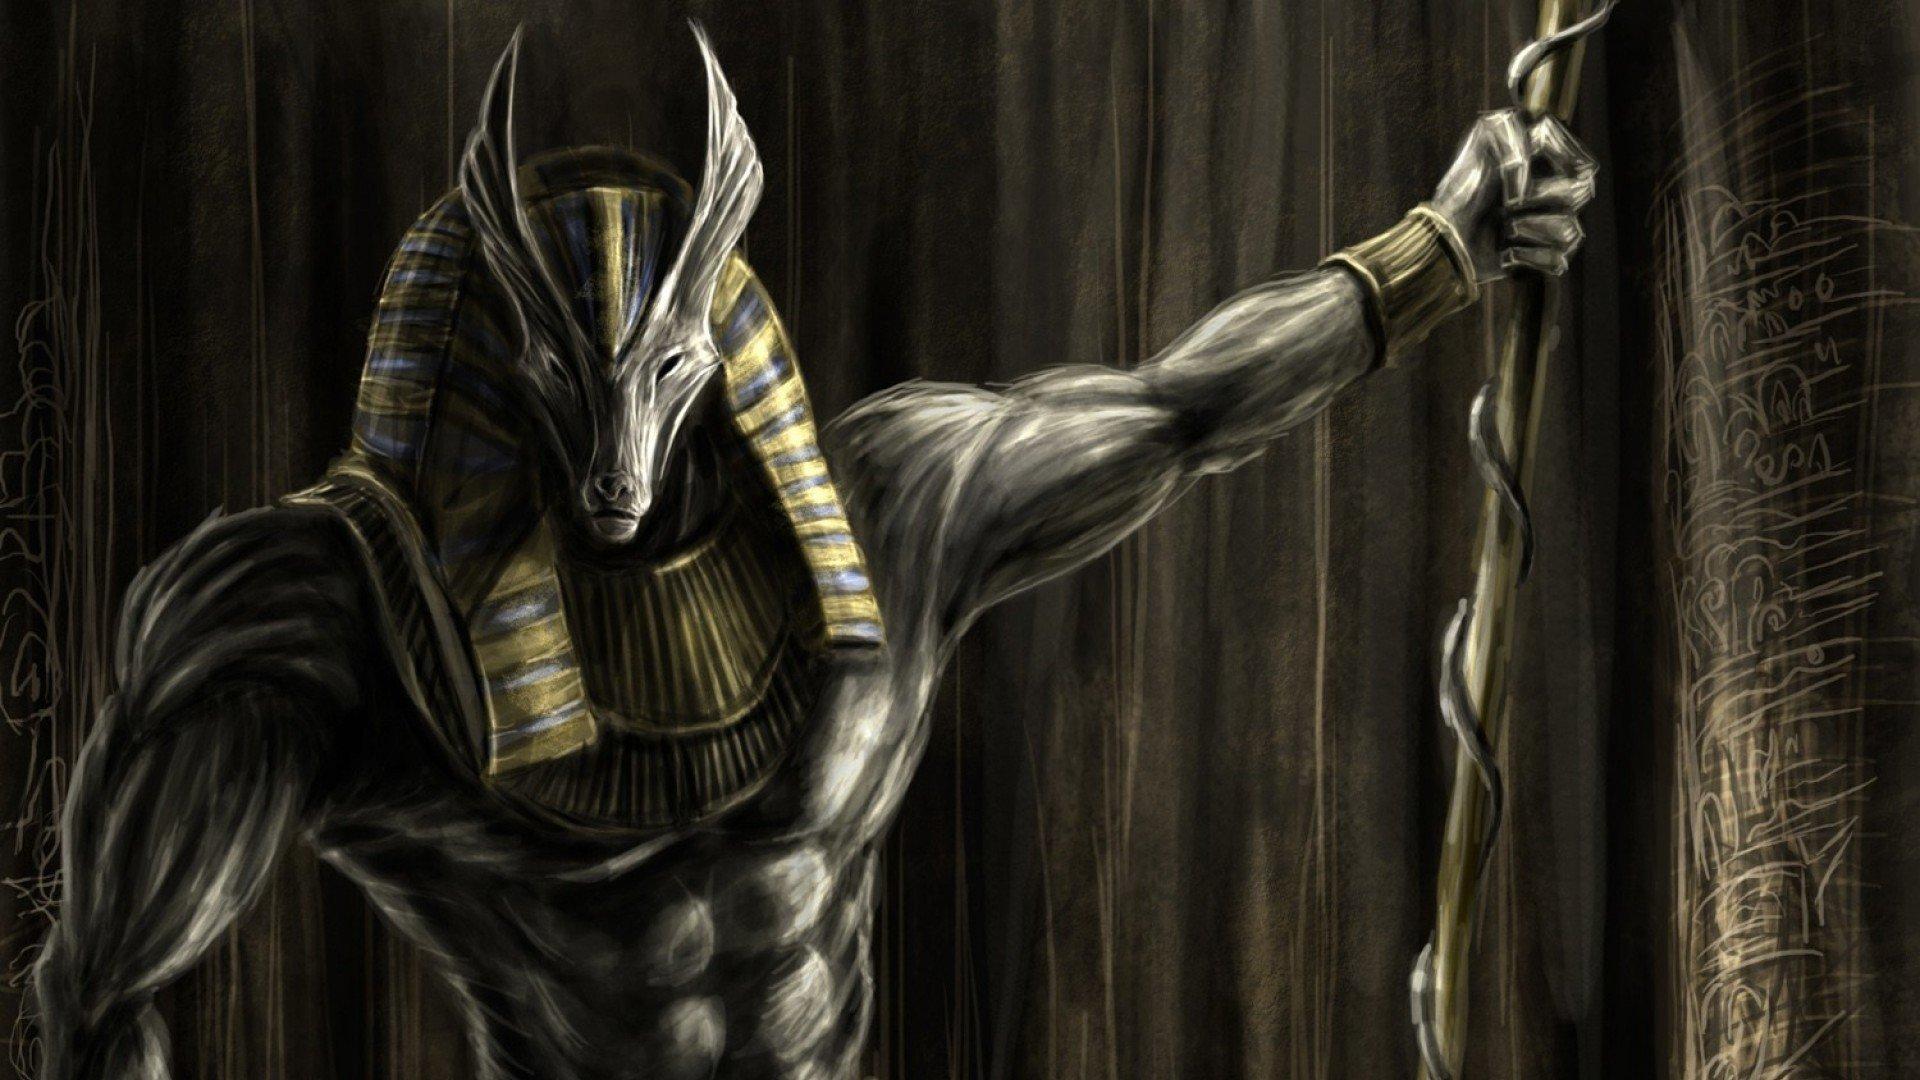 Papel De Parede 1920x1080 Px Playerunknowns: Papel De Parede : 1920x1080 Px, Anubis, Deuses Do Egito